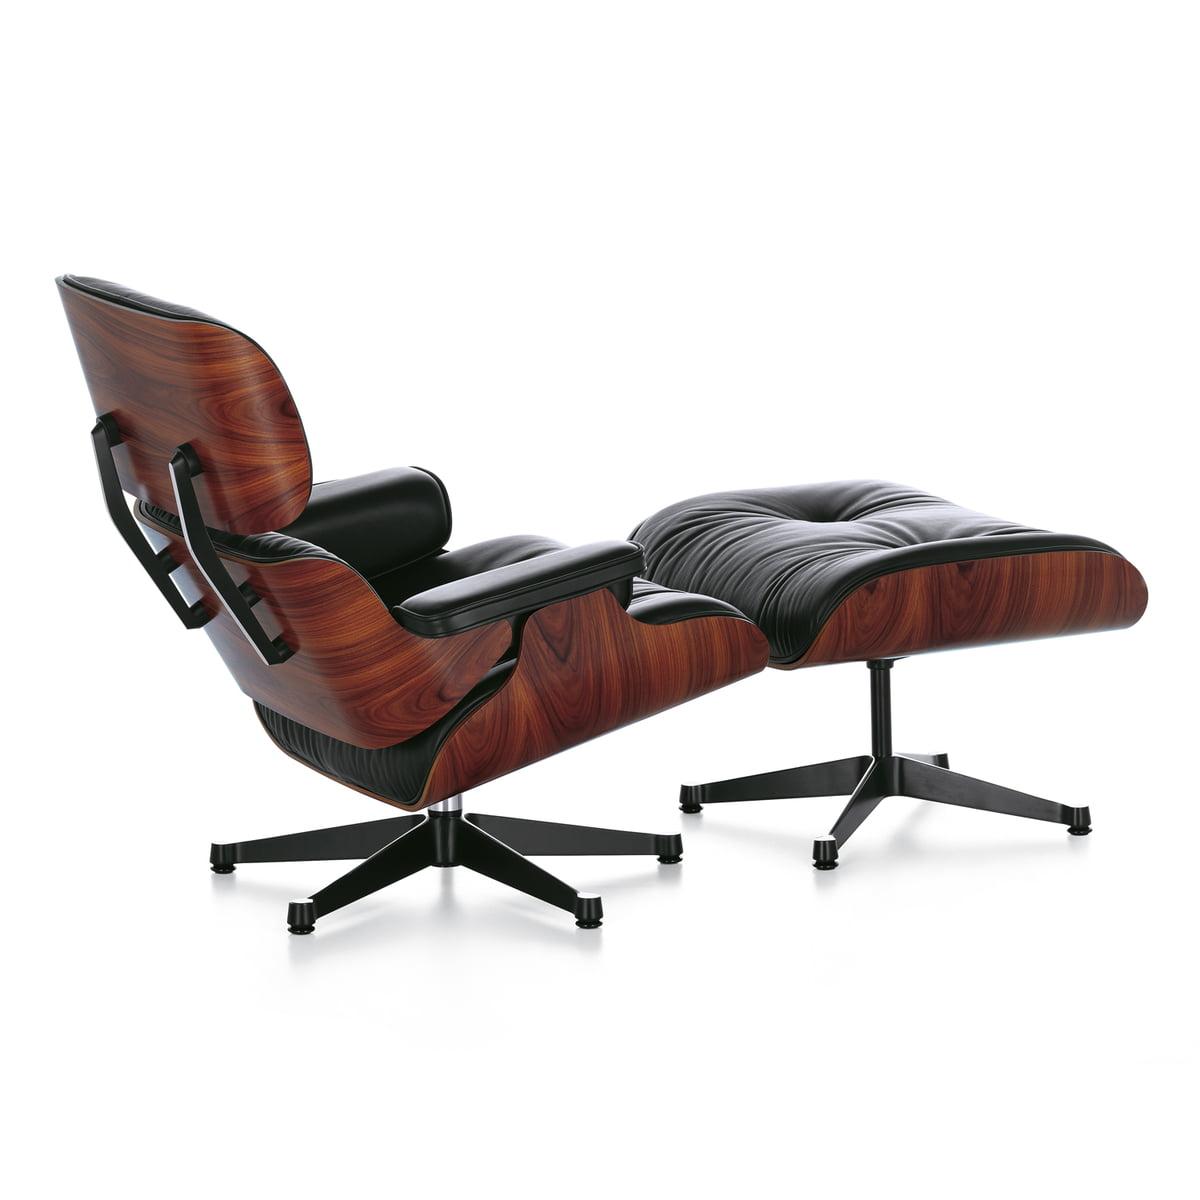 vitra lounge chair ottoman santos palisander - Eames Lounge Stuhl Abmessungen